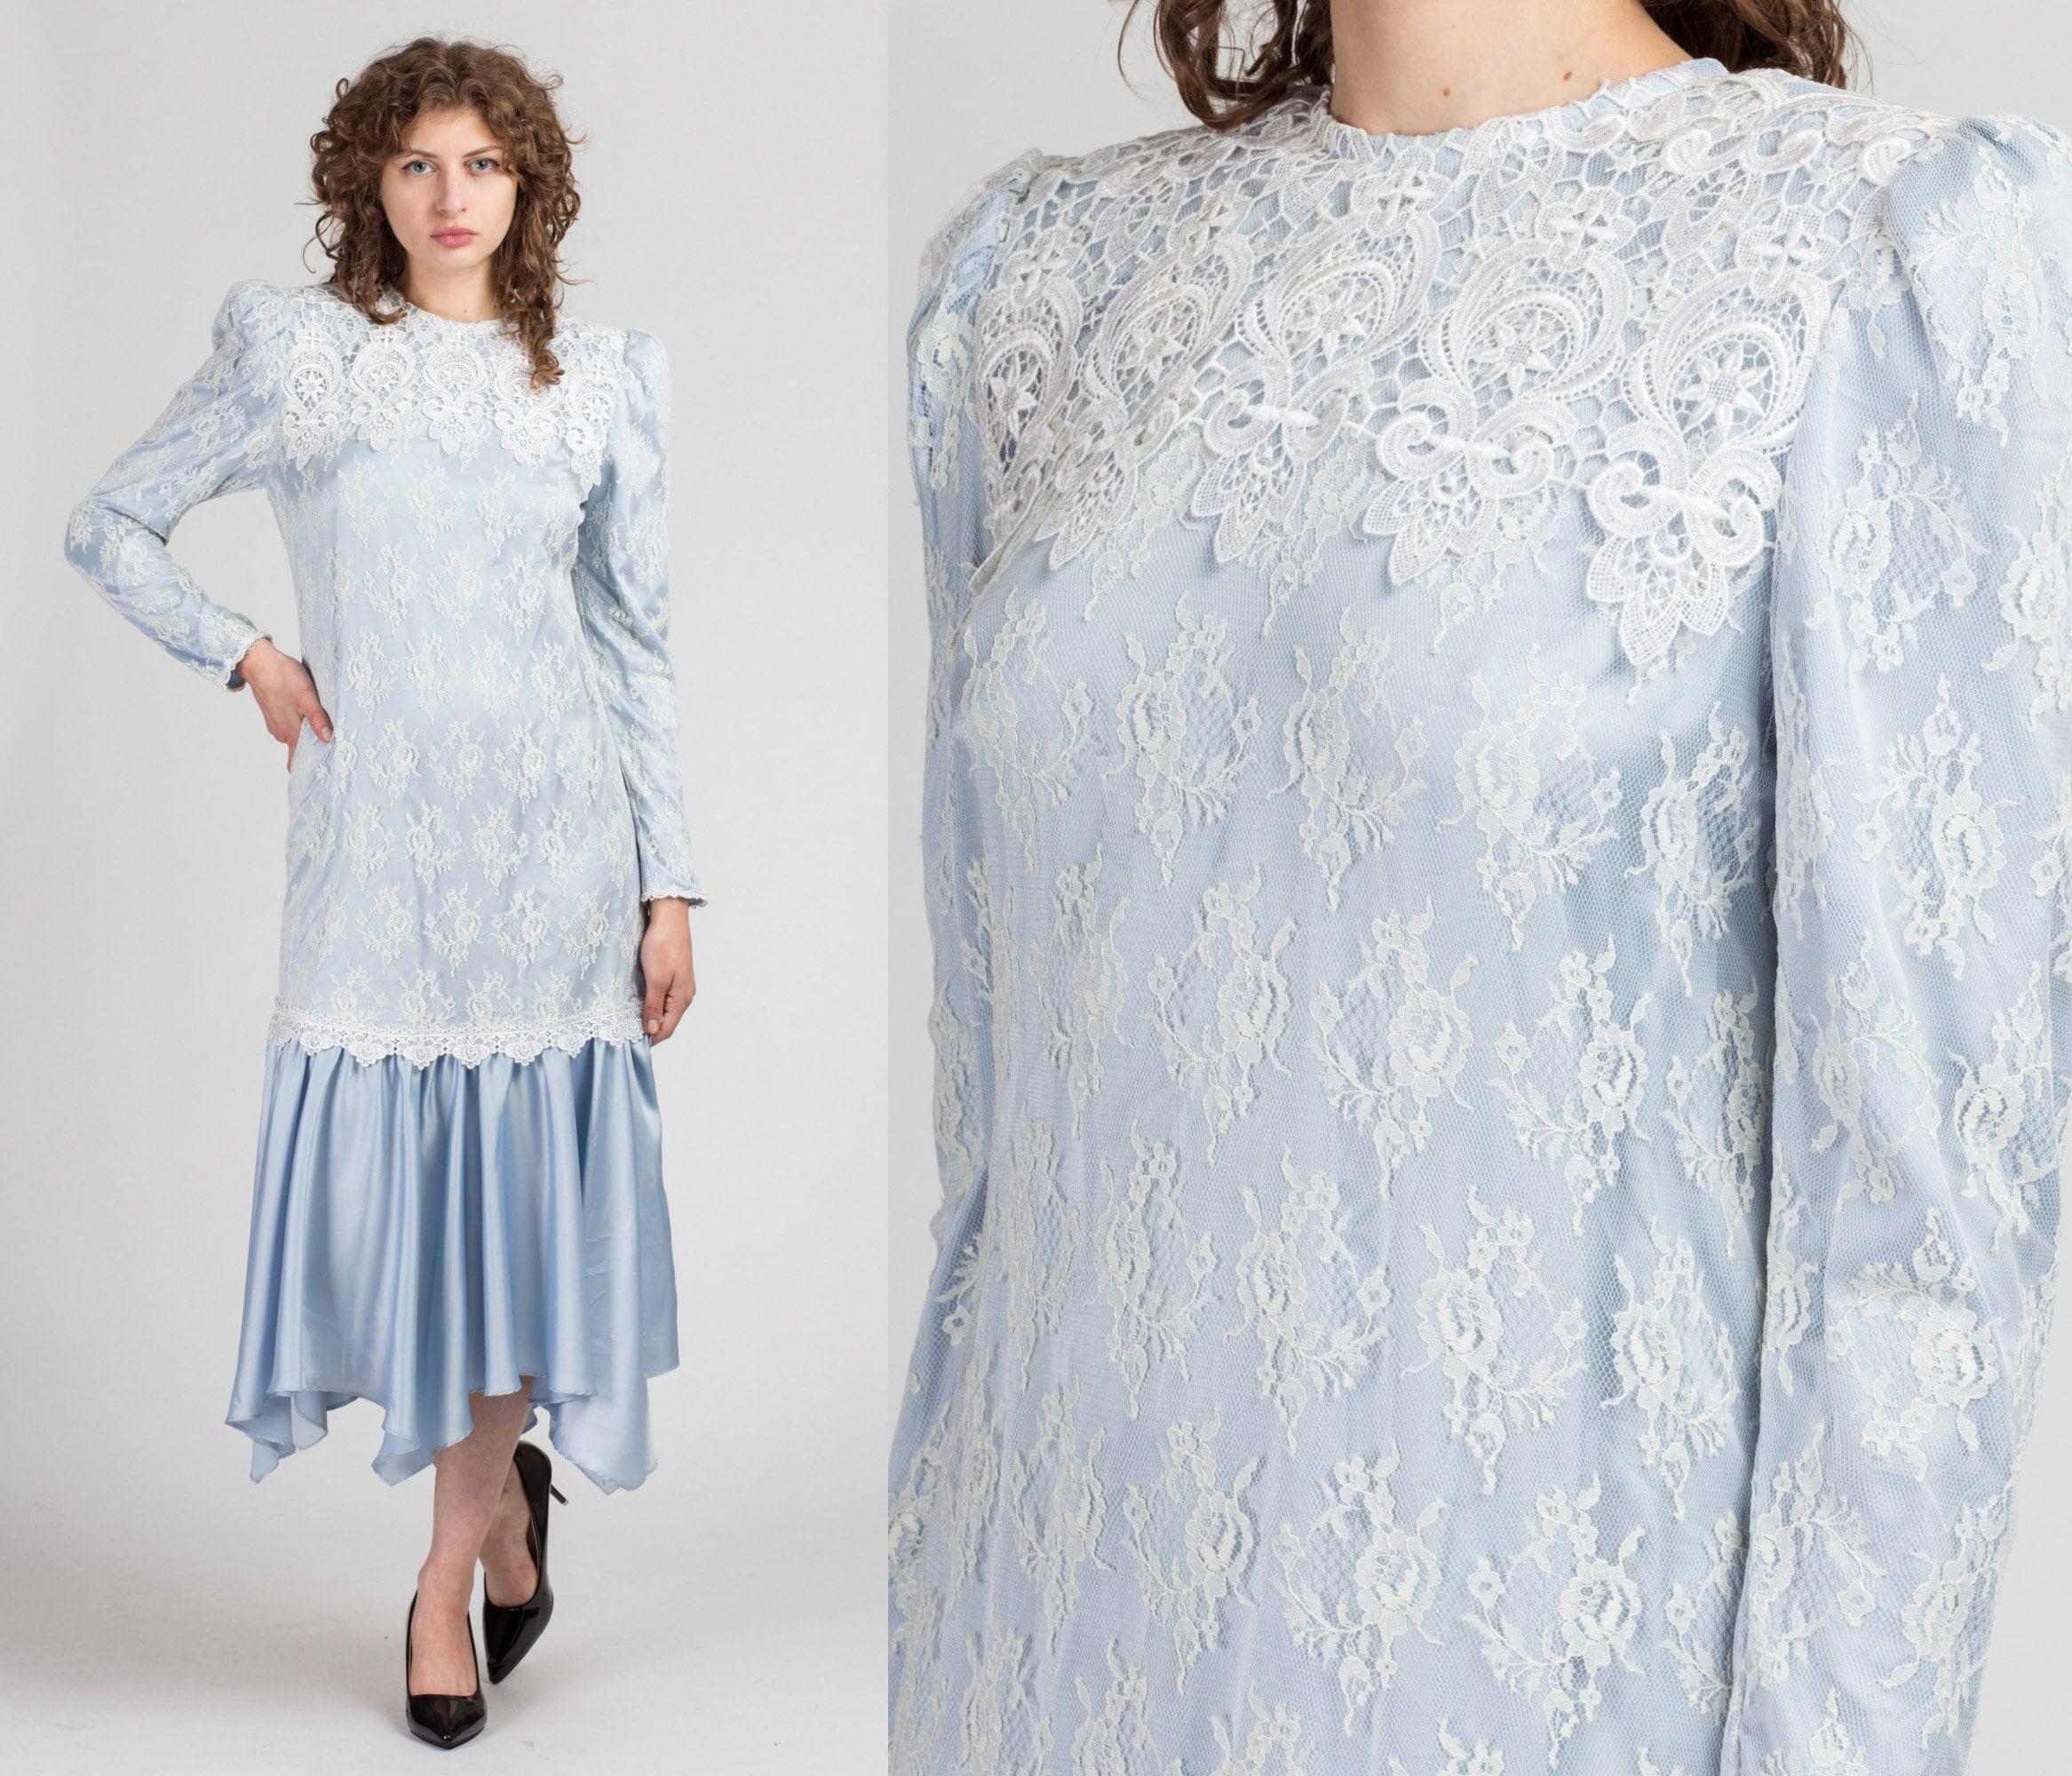 Vintage Scarf Styles -1920s to 1960s 80S Scott Mcclintock Lace  Satin Midi Dress - Large  Vintage Blue White Scarf Hem Party $19.95 AT vintagedancer.com